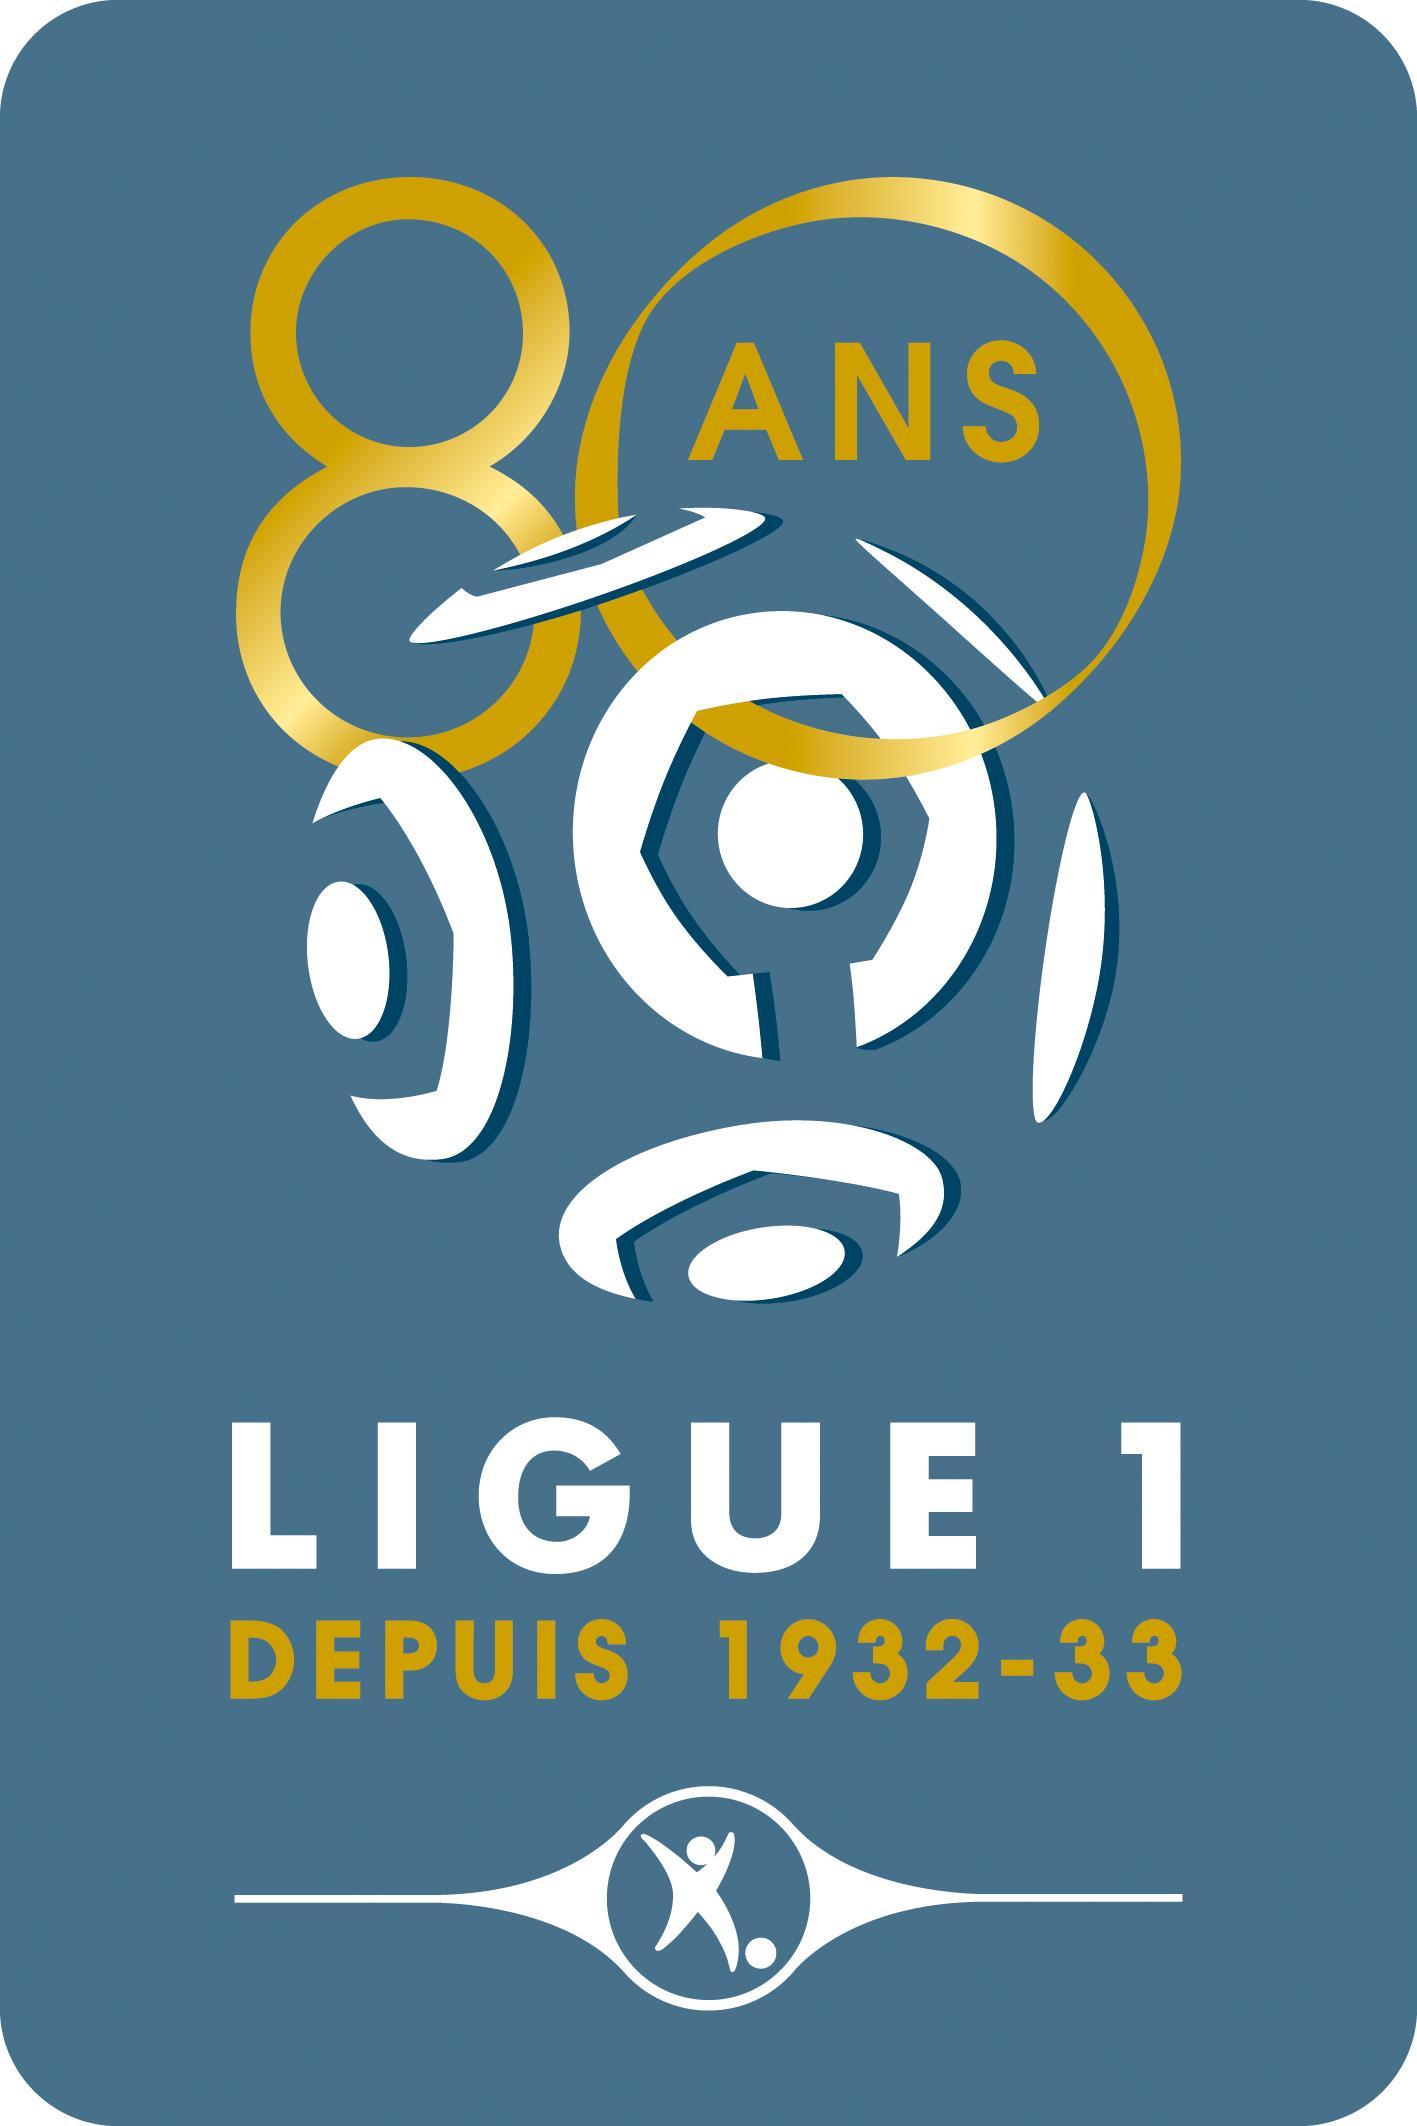 Ligue 1 : La saison 2012-13